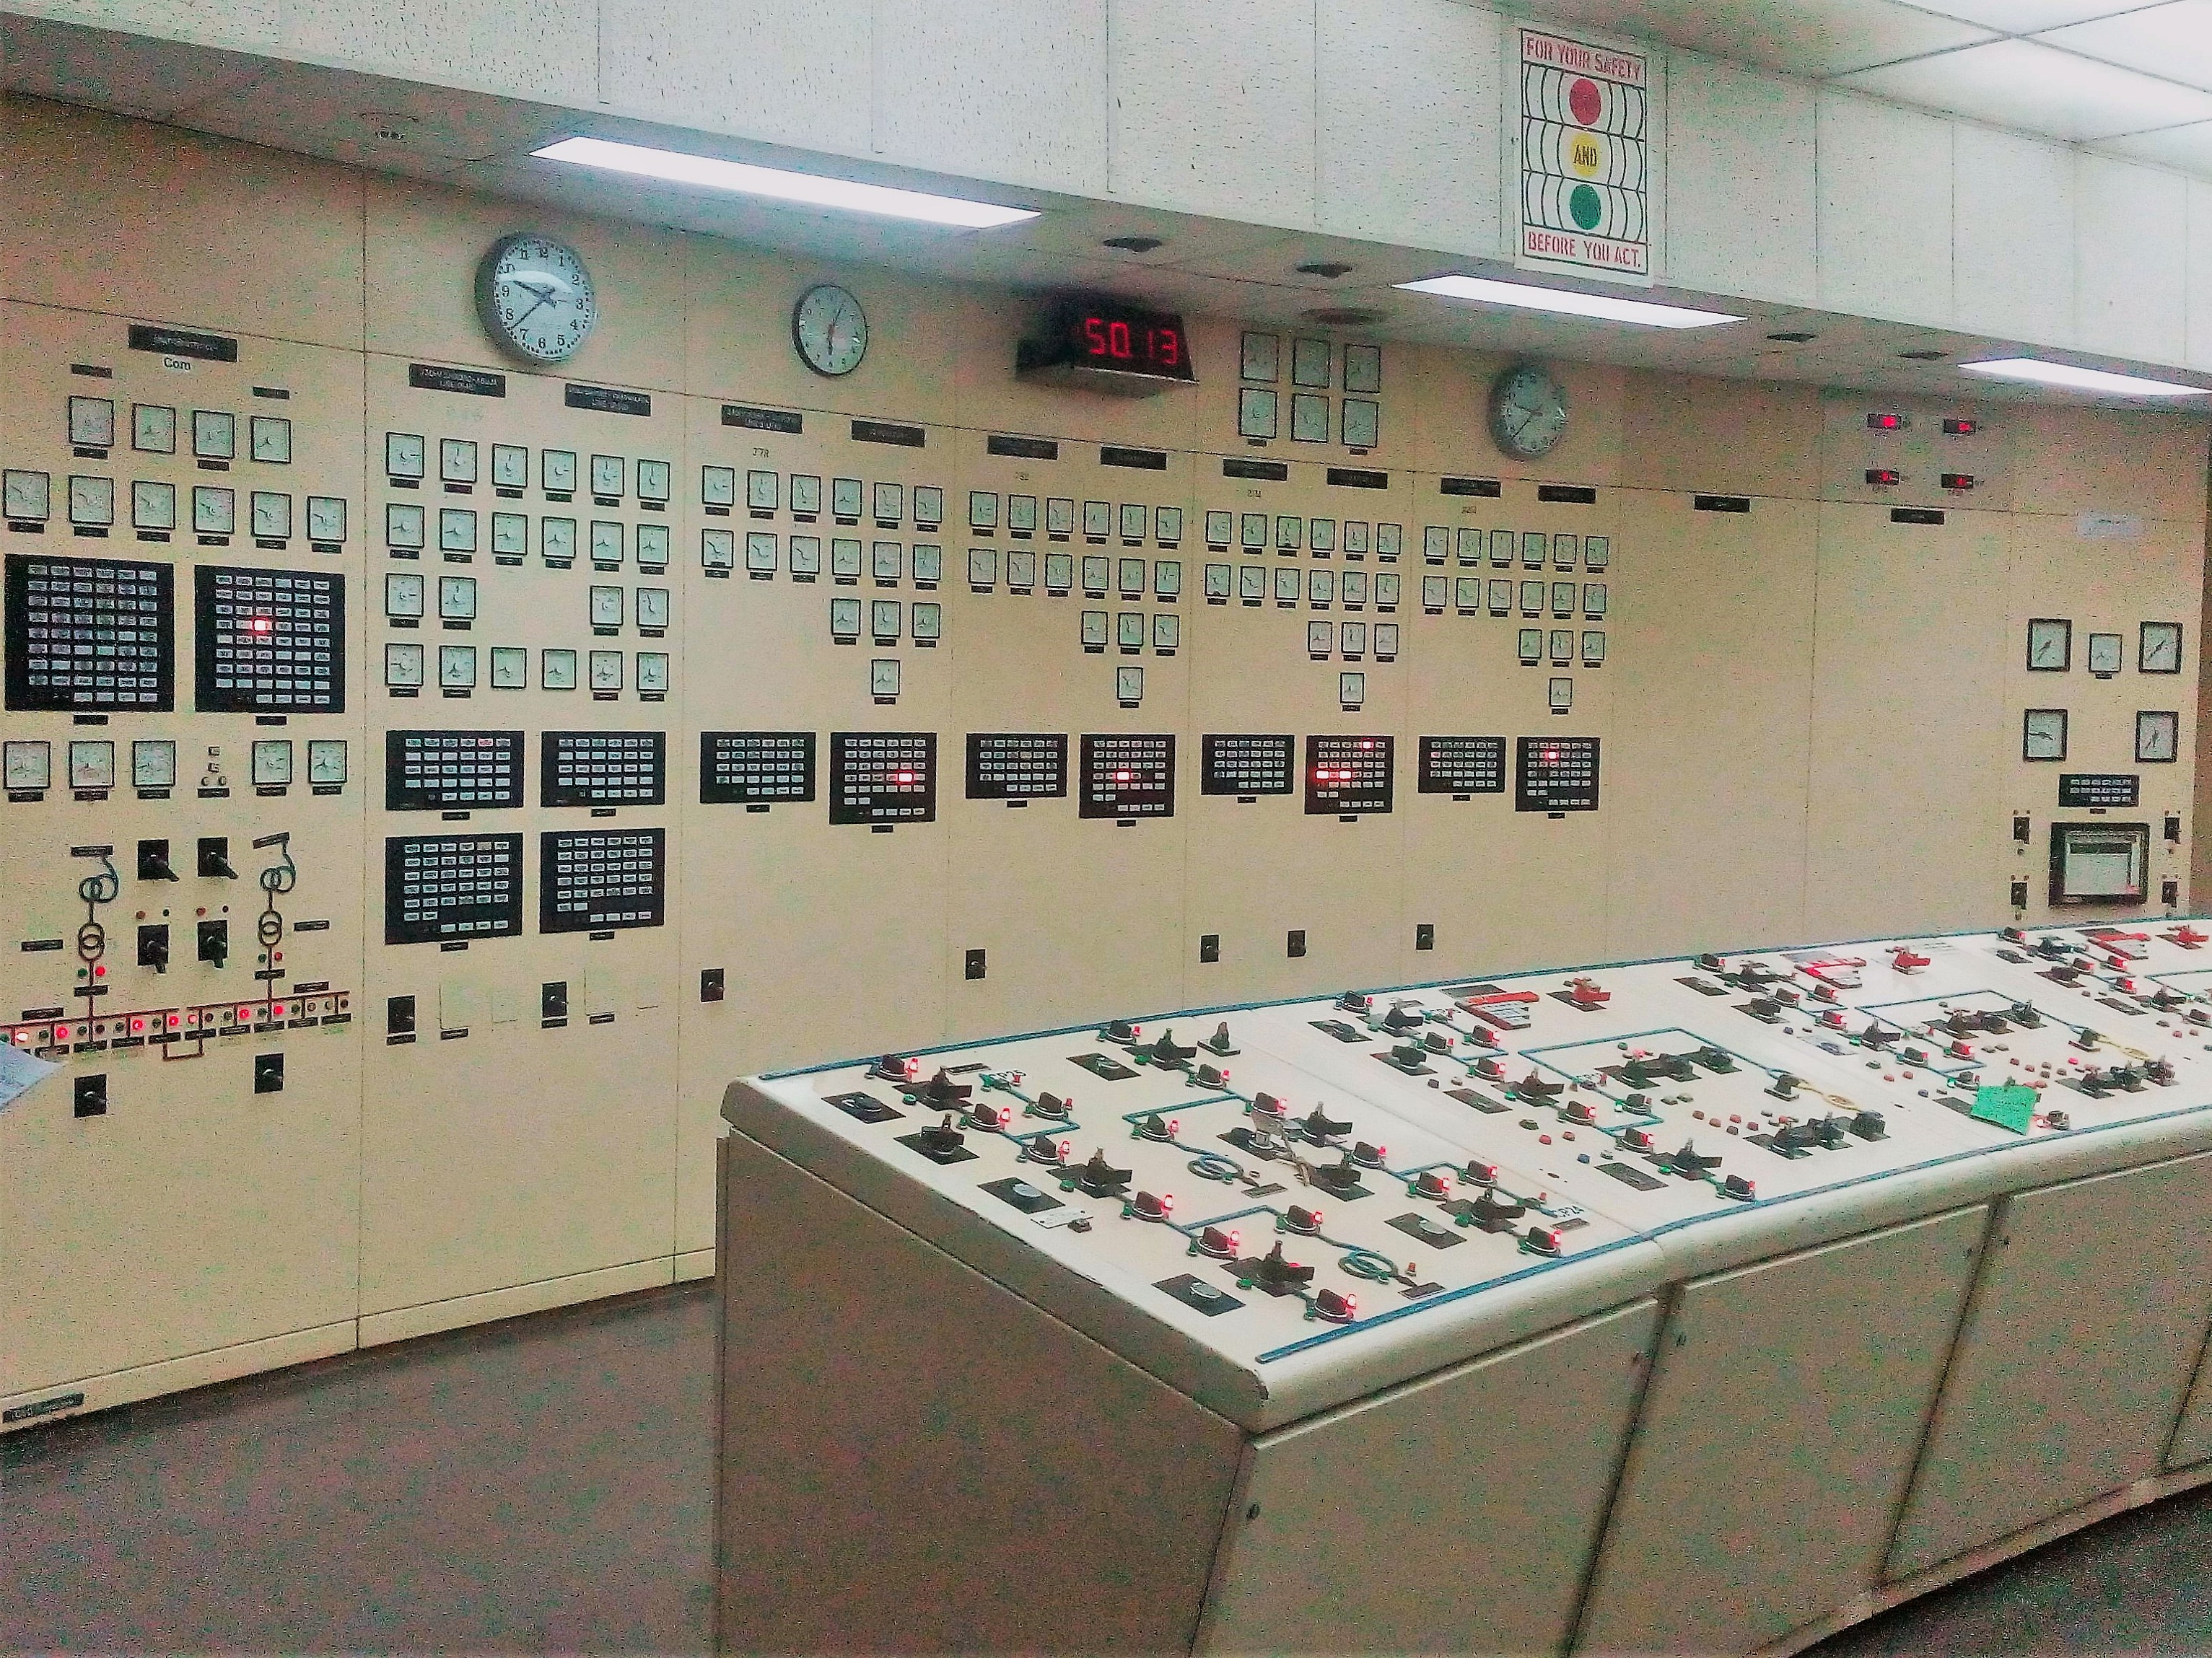 SHIRORO HYDRO ELECTRIC POWER PLANT